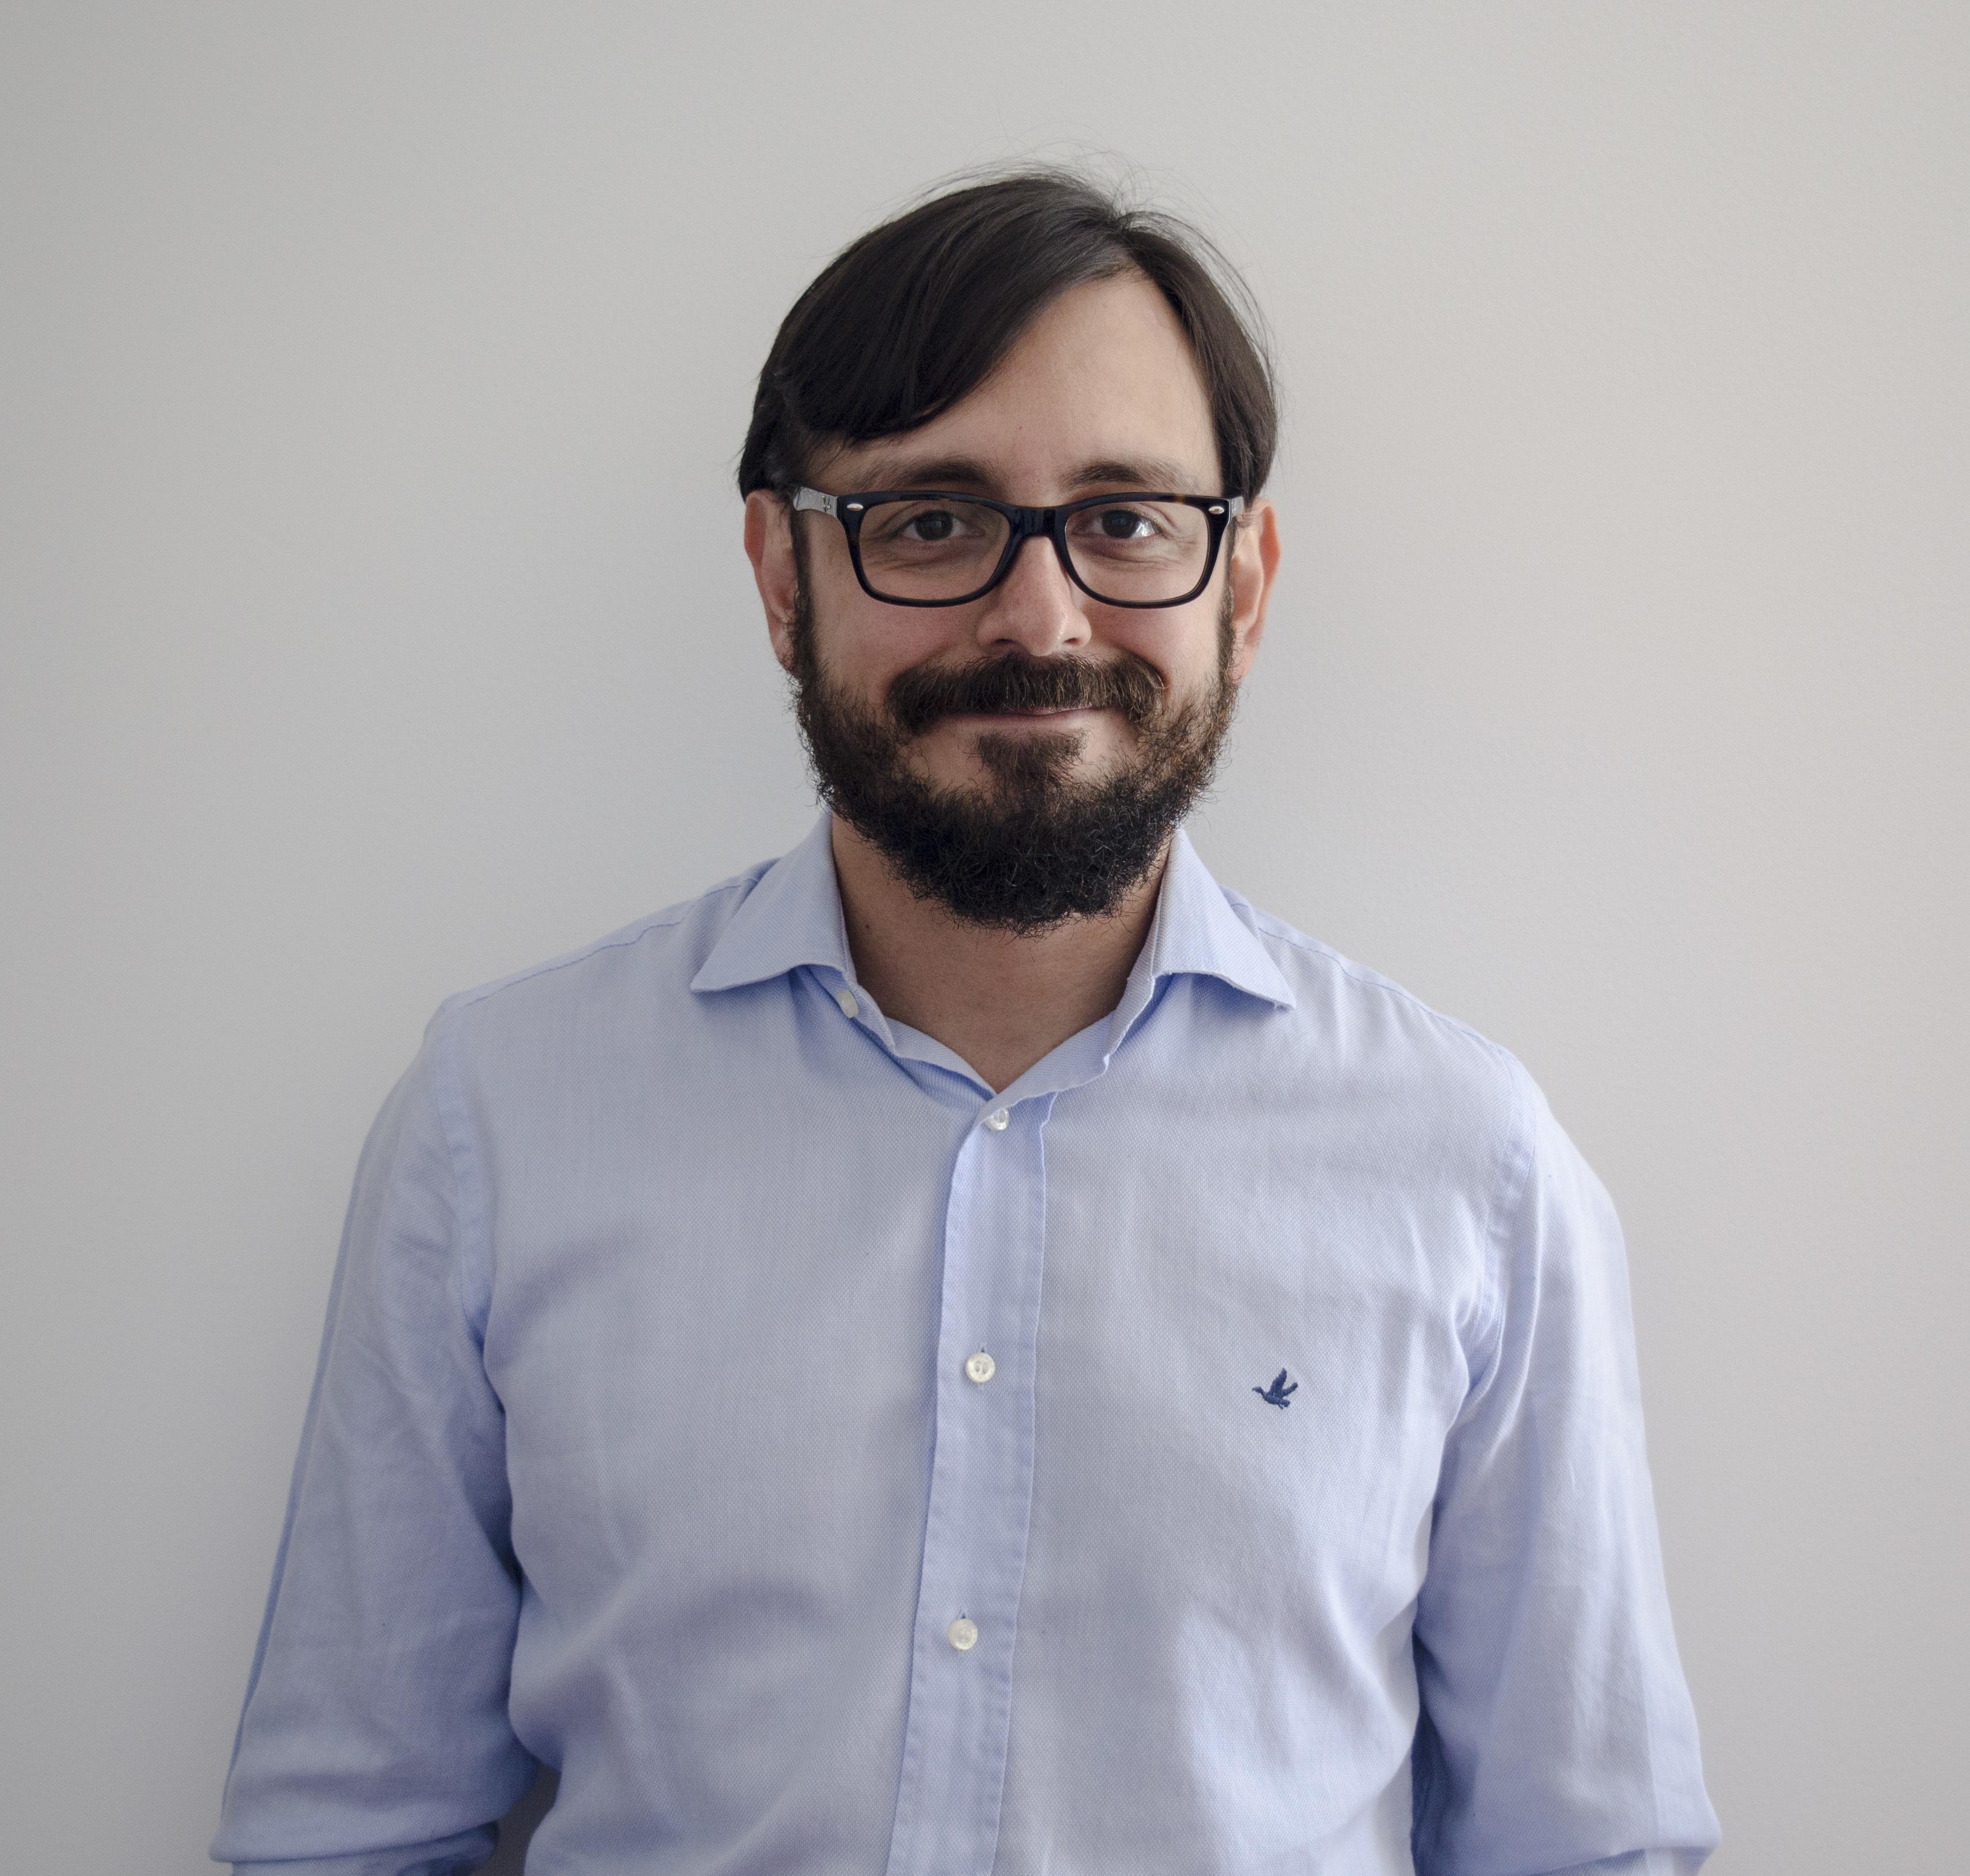 Oscar Barquero Fernández - Psiquiatría | HuliHealth